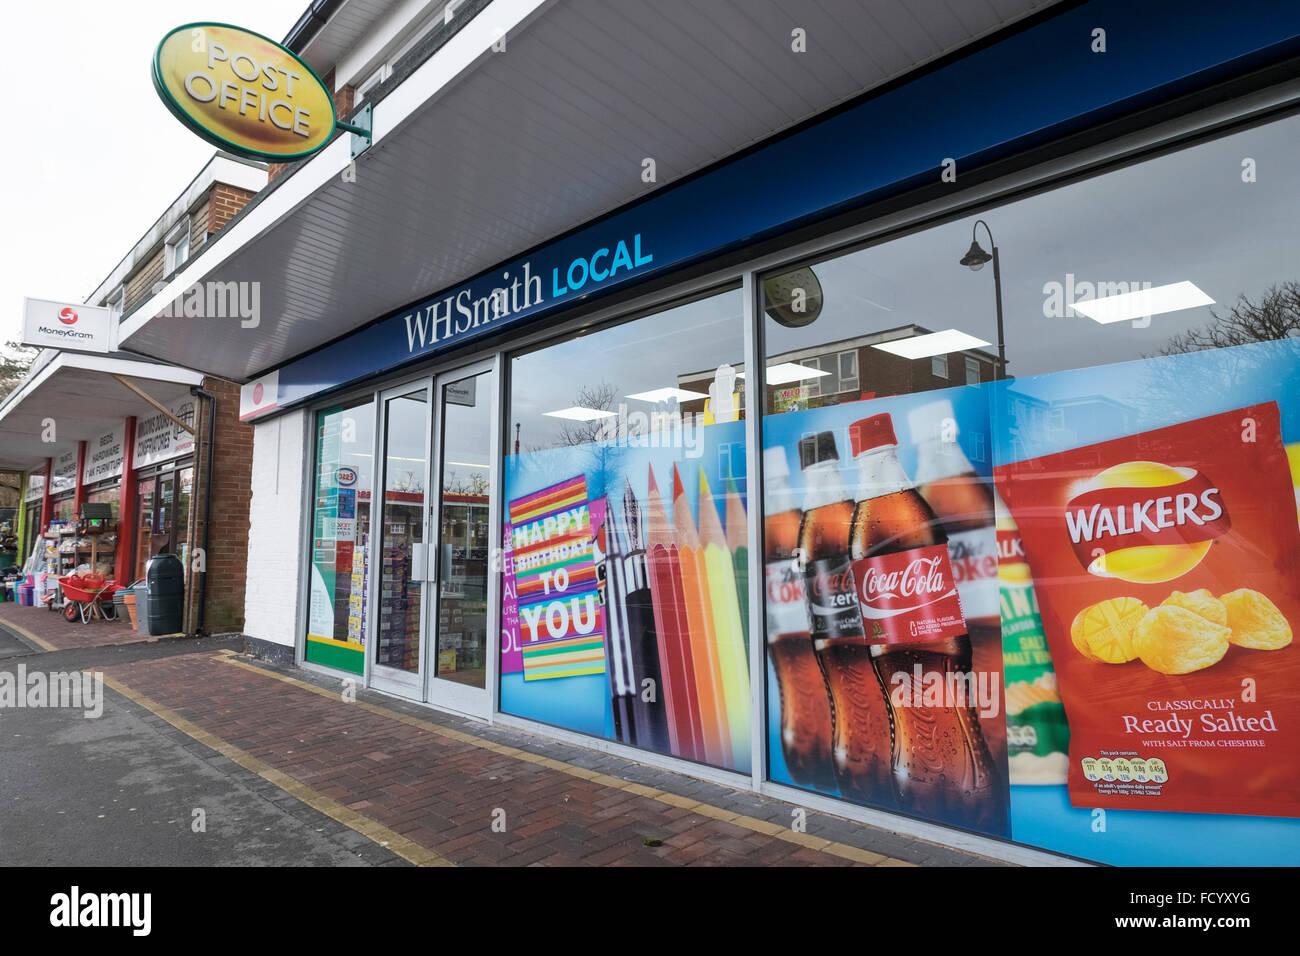 WH Smith Local store in Dibden Purlieu in Hampshire. - Stock Image